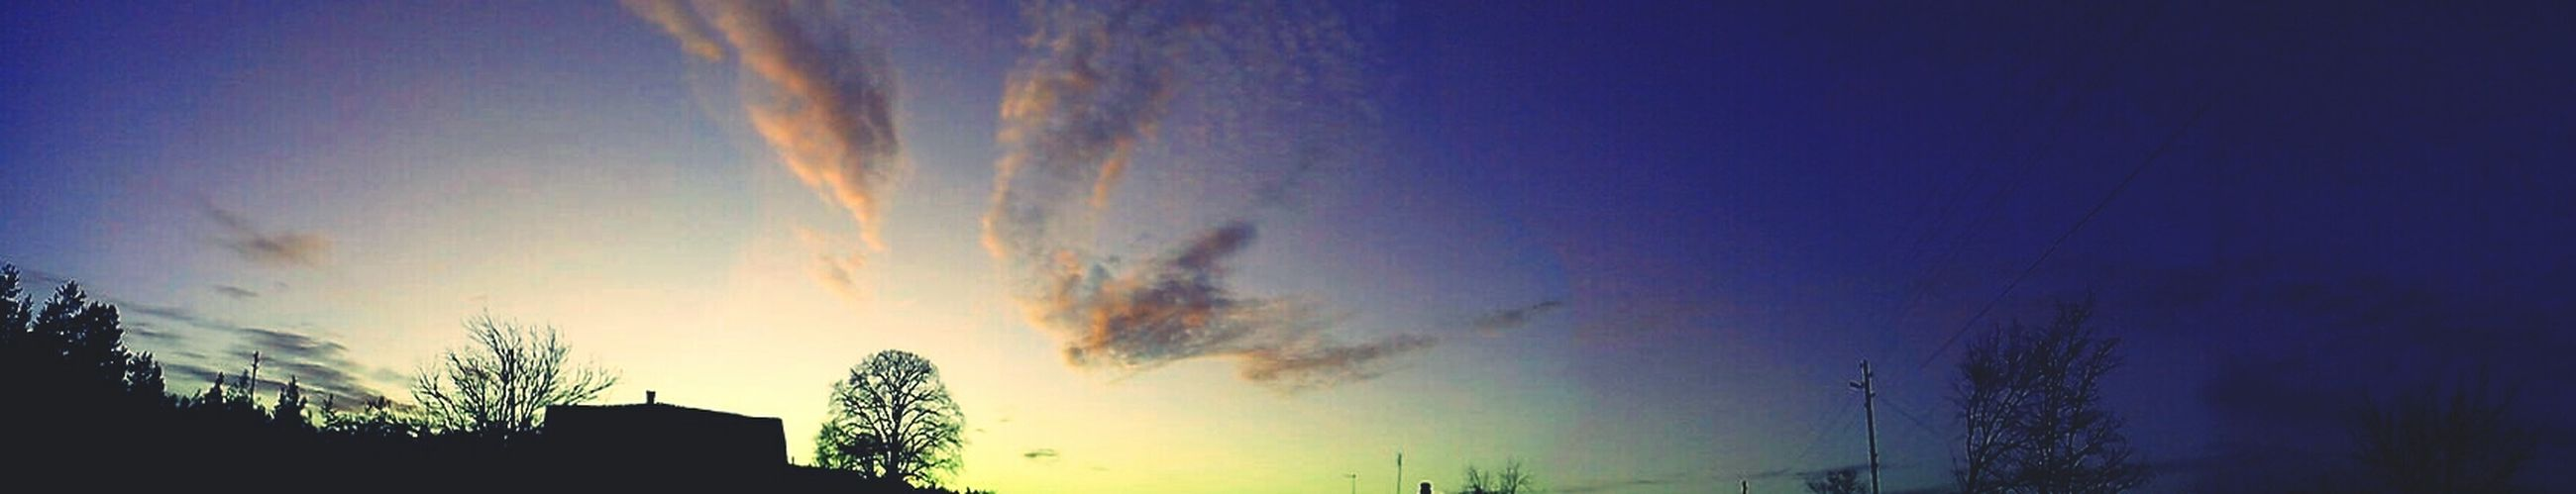 Cool panorama